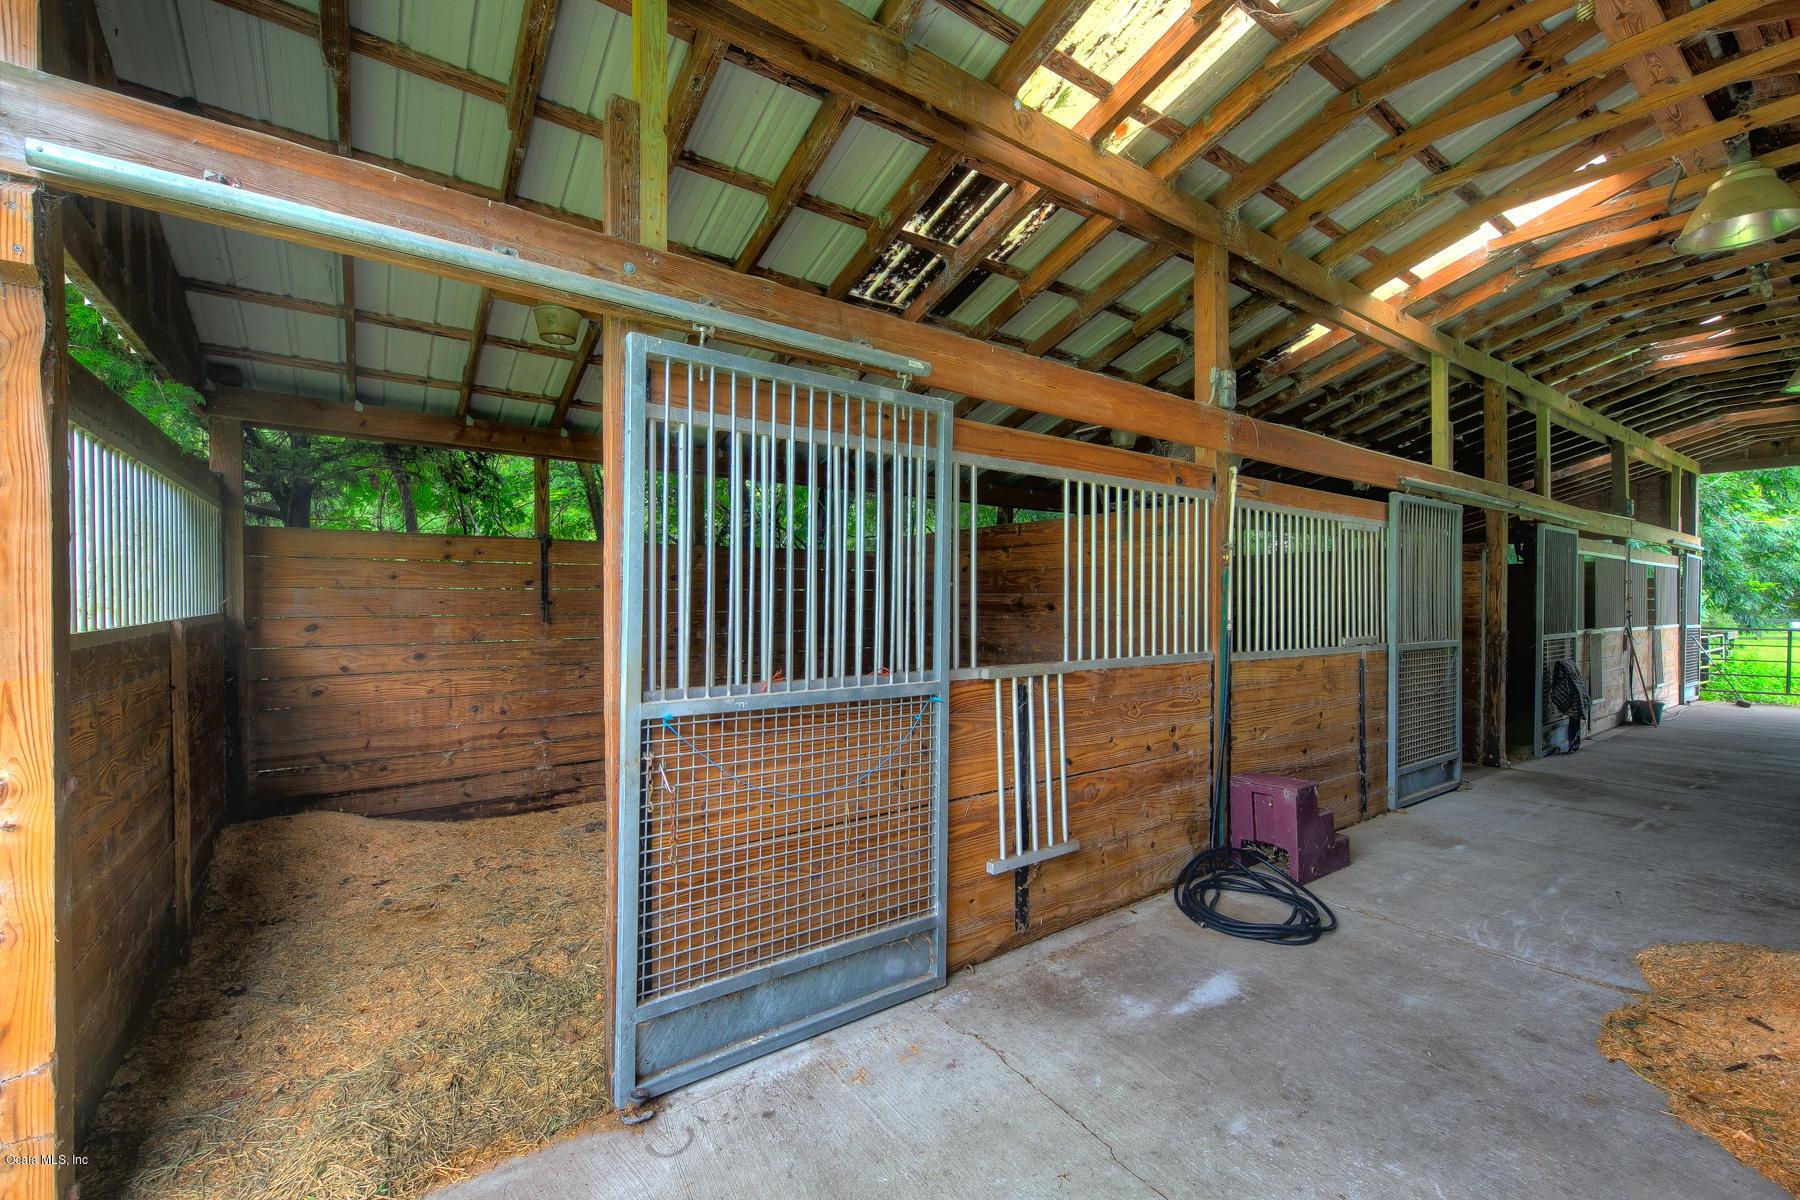 5 Acre Ocala Florida Horse Farm For Sale Ohp6219